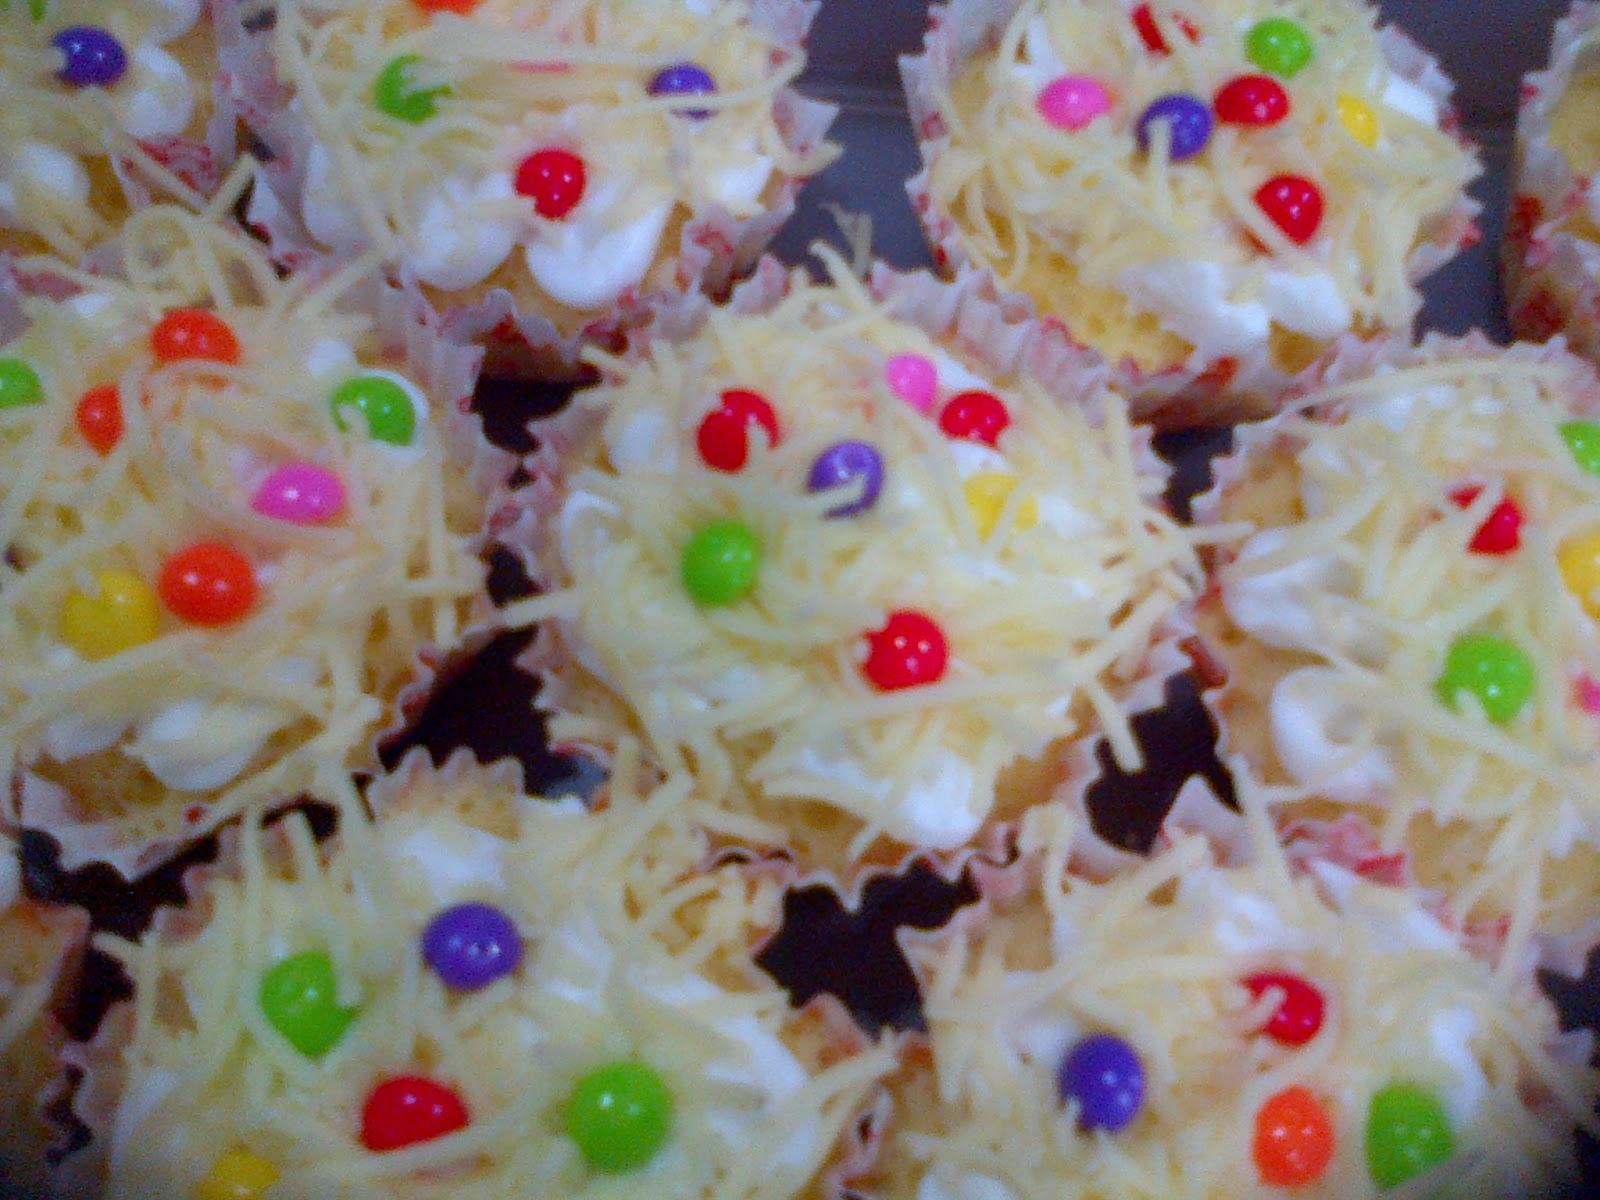 Resep Cake Yogurt Kukus: Cup Cake Keju Kukus